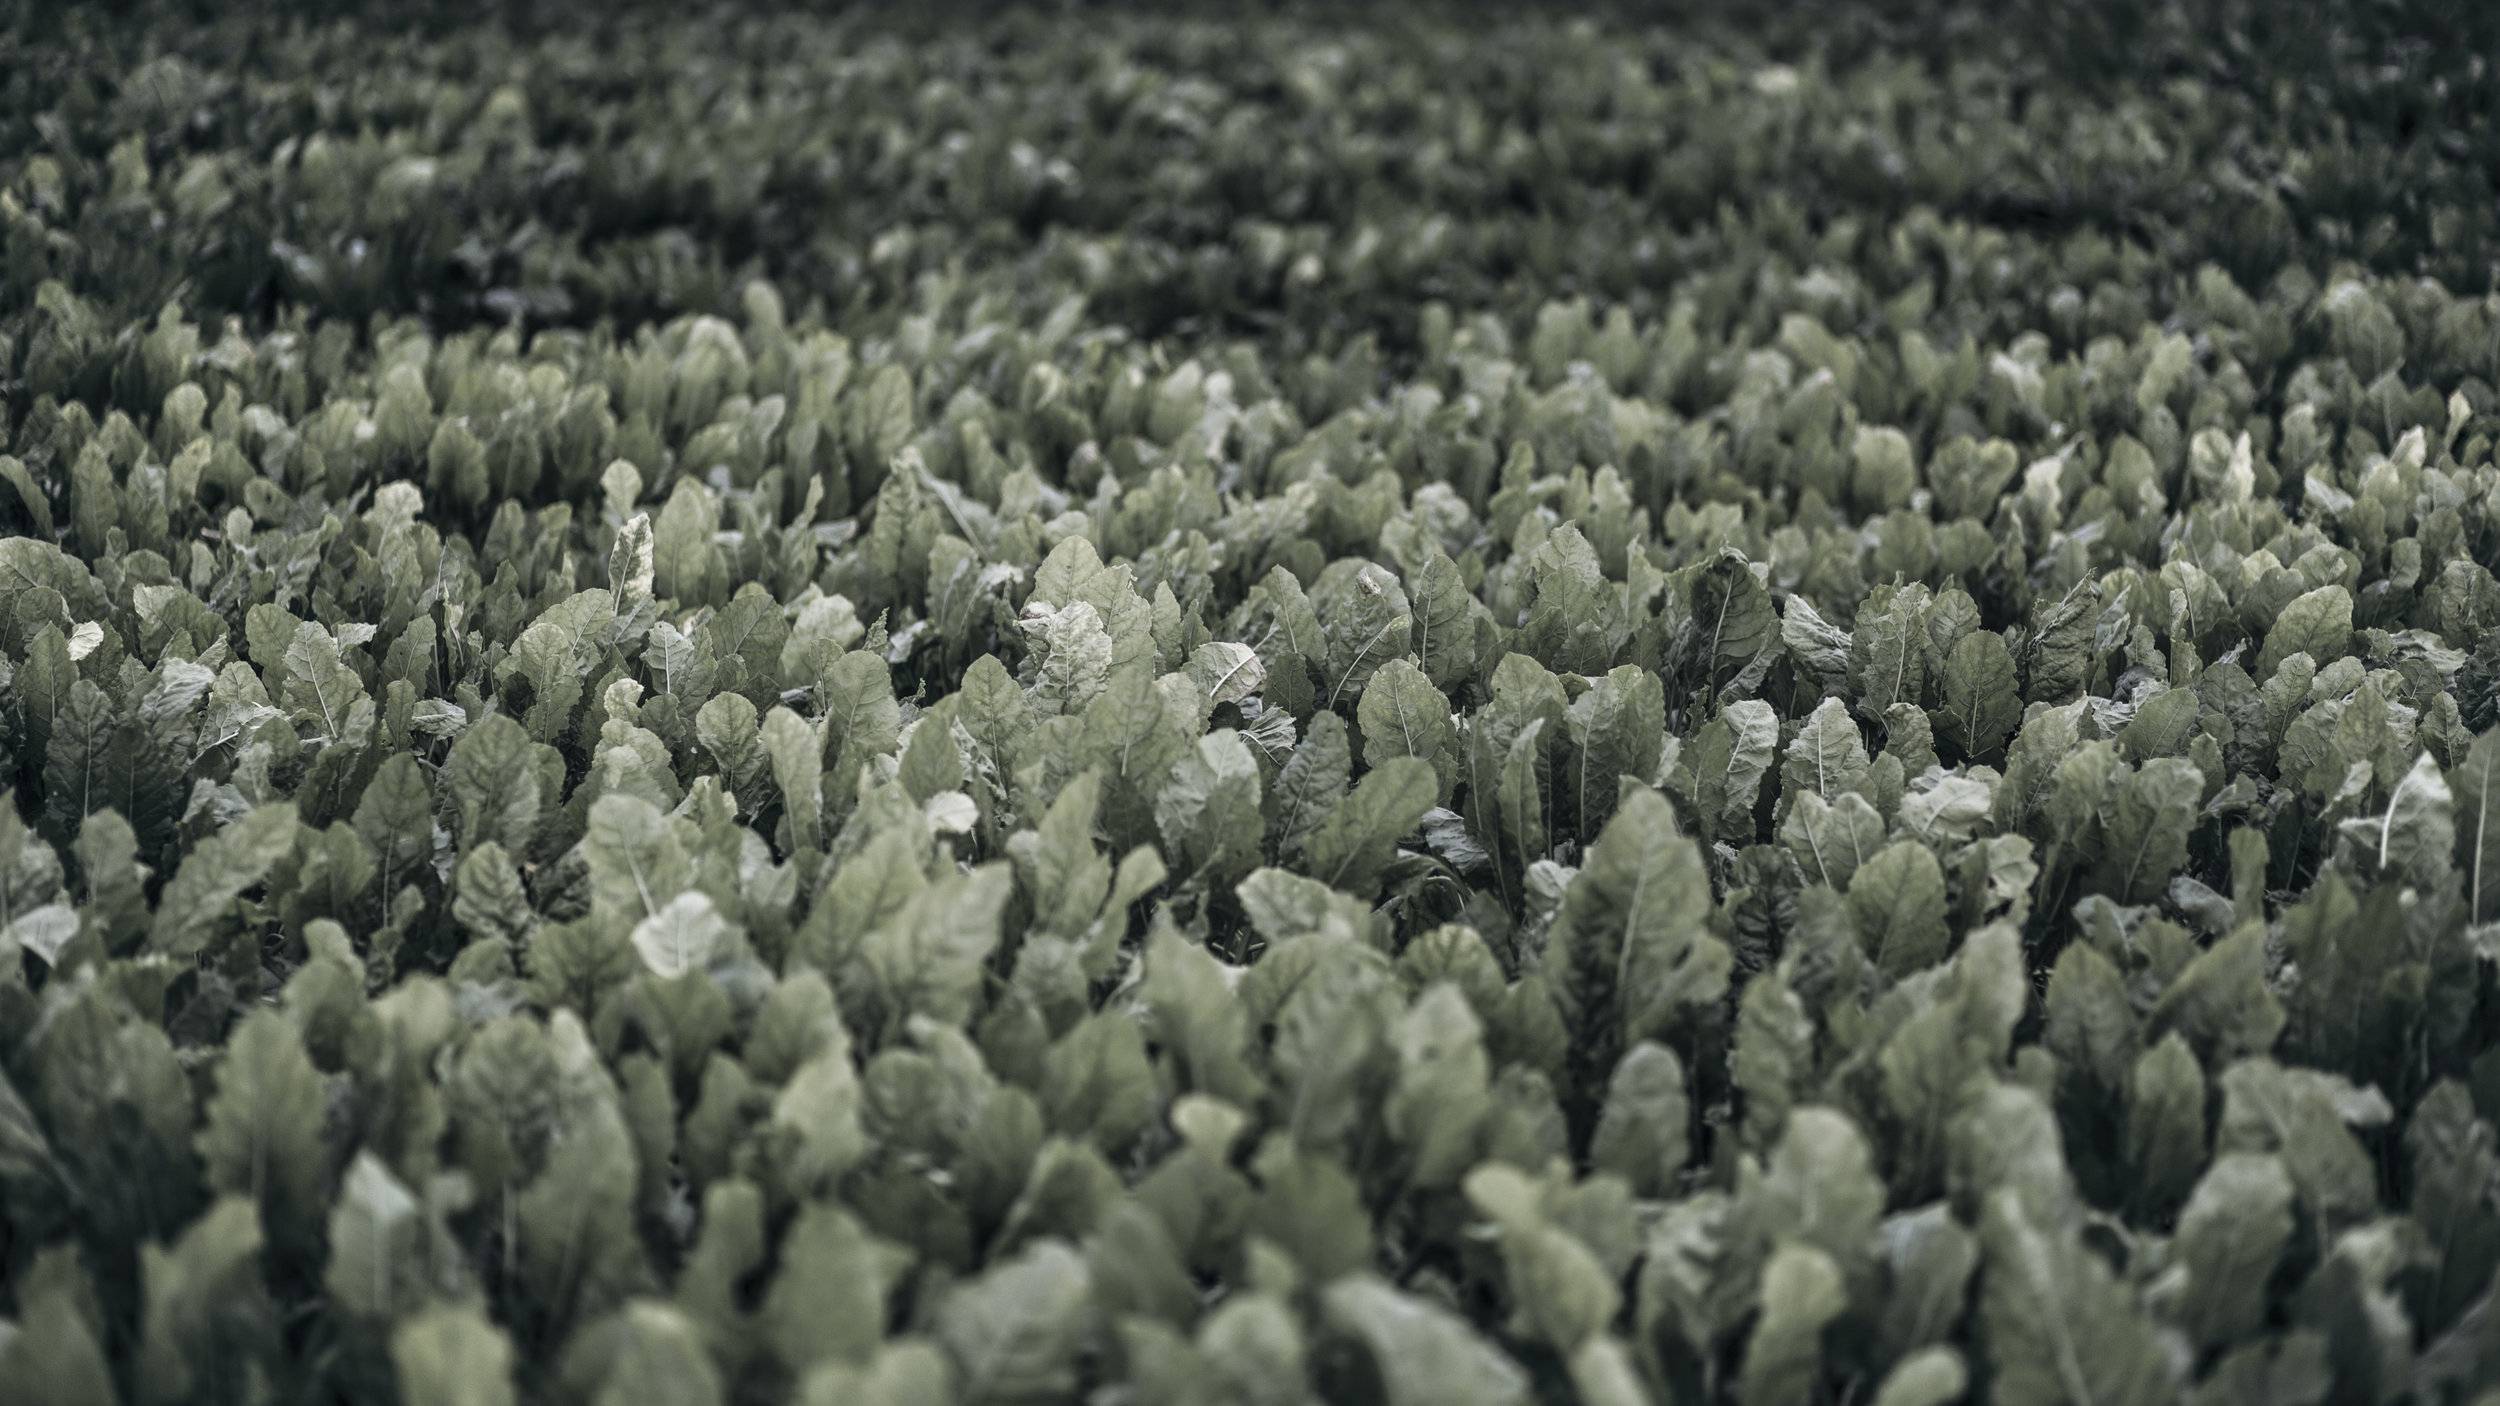 AgriculturalLandscape-3.jpg